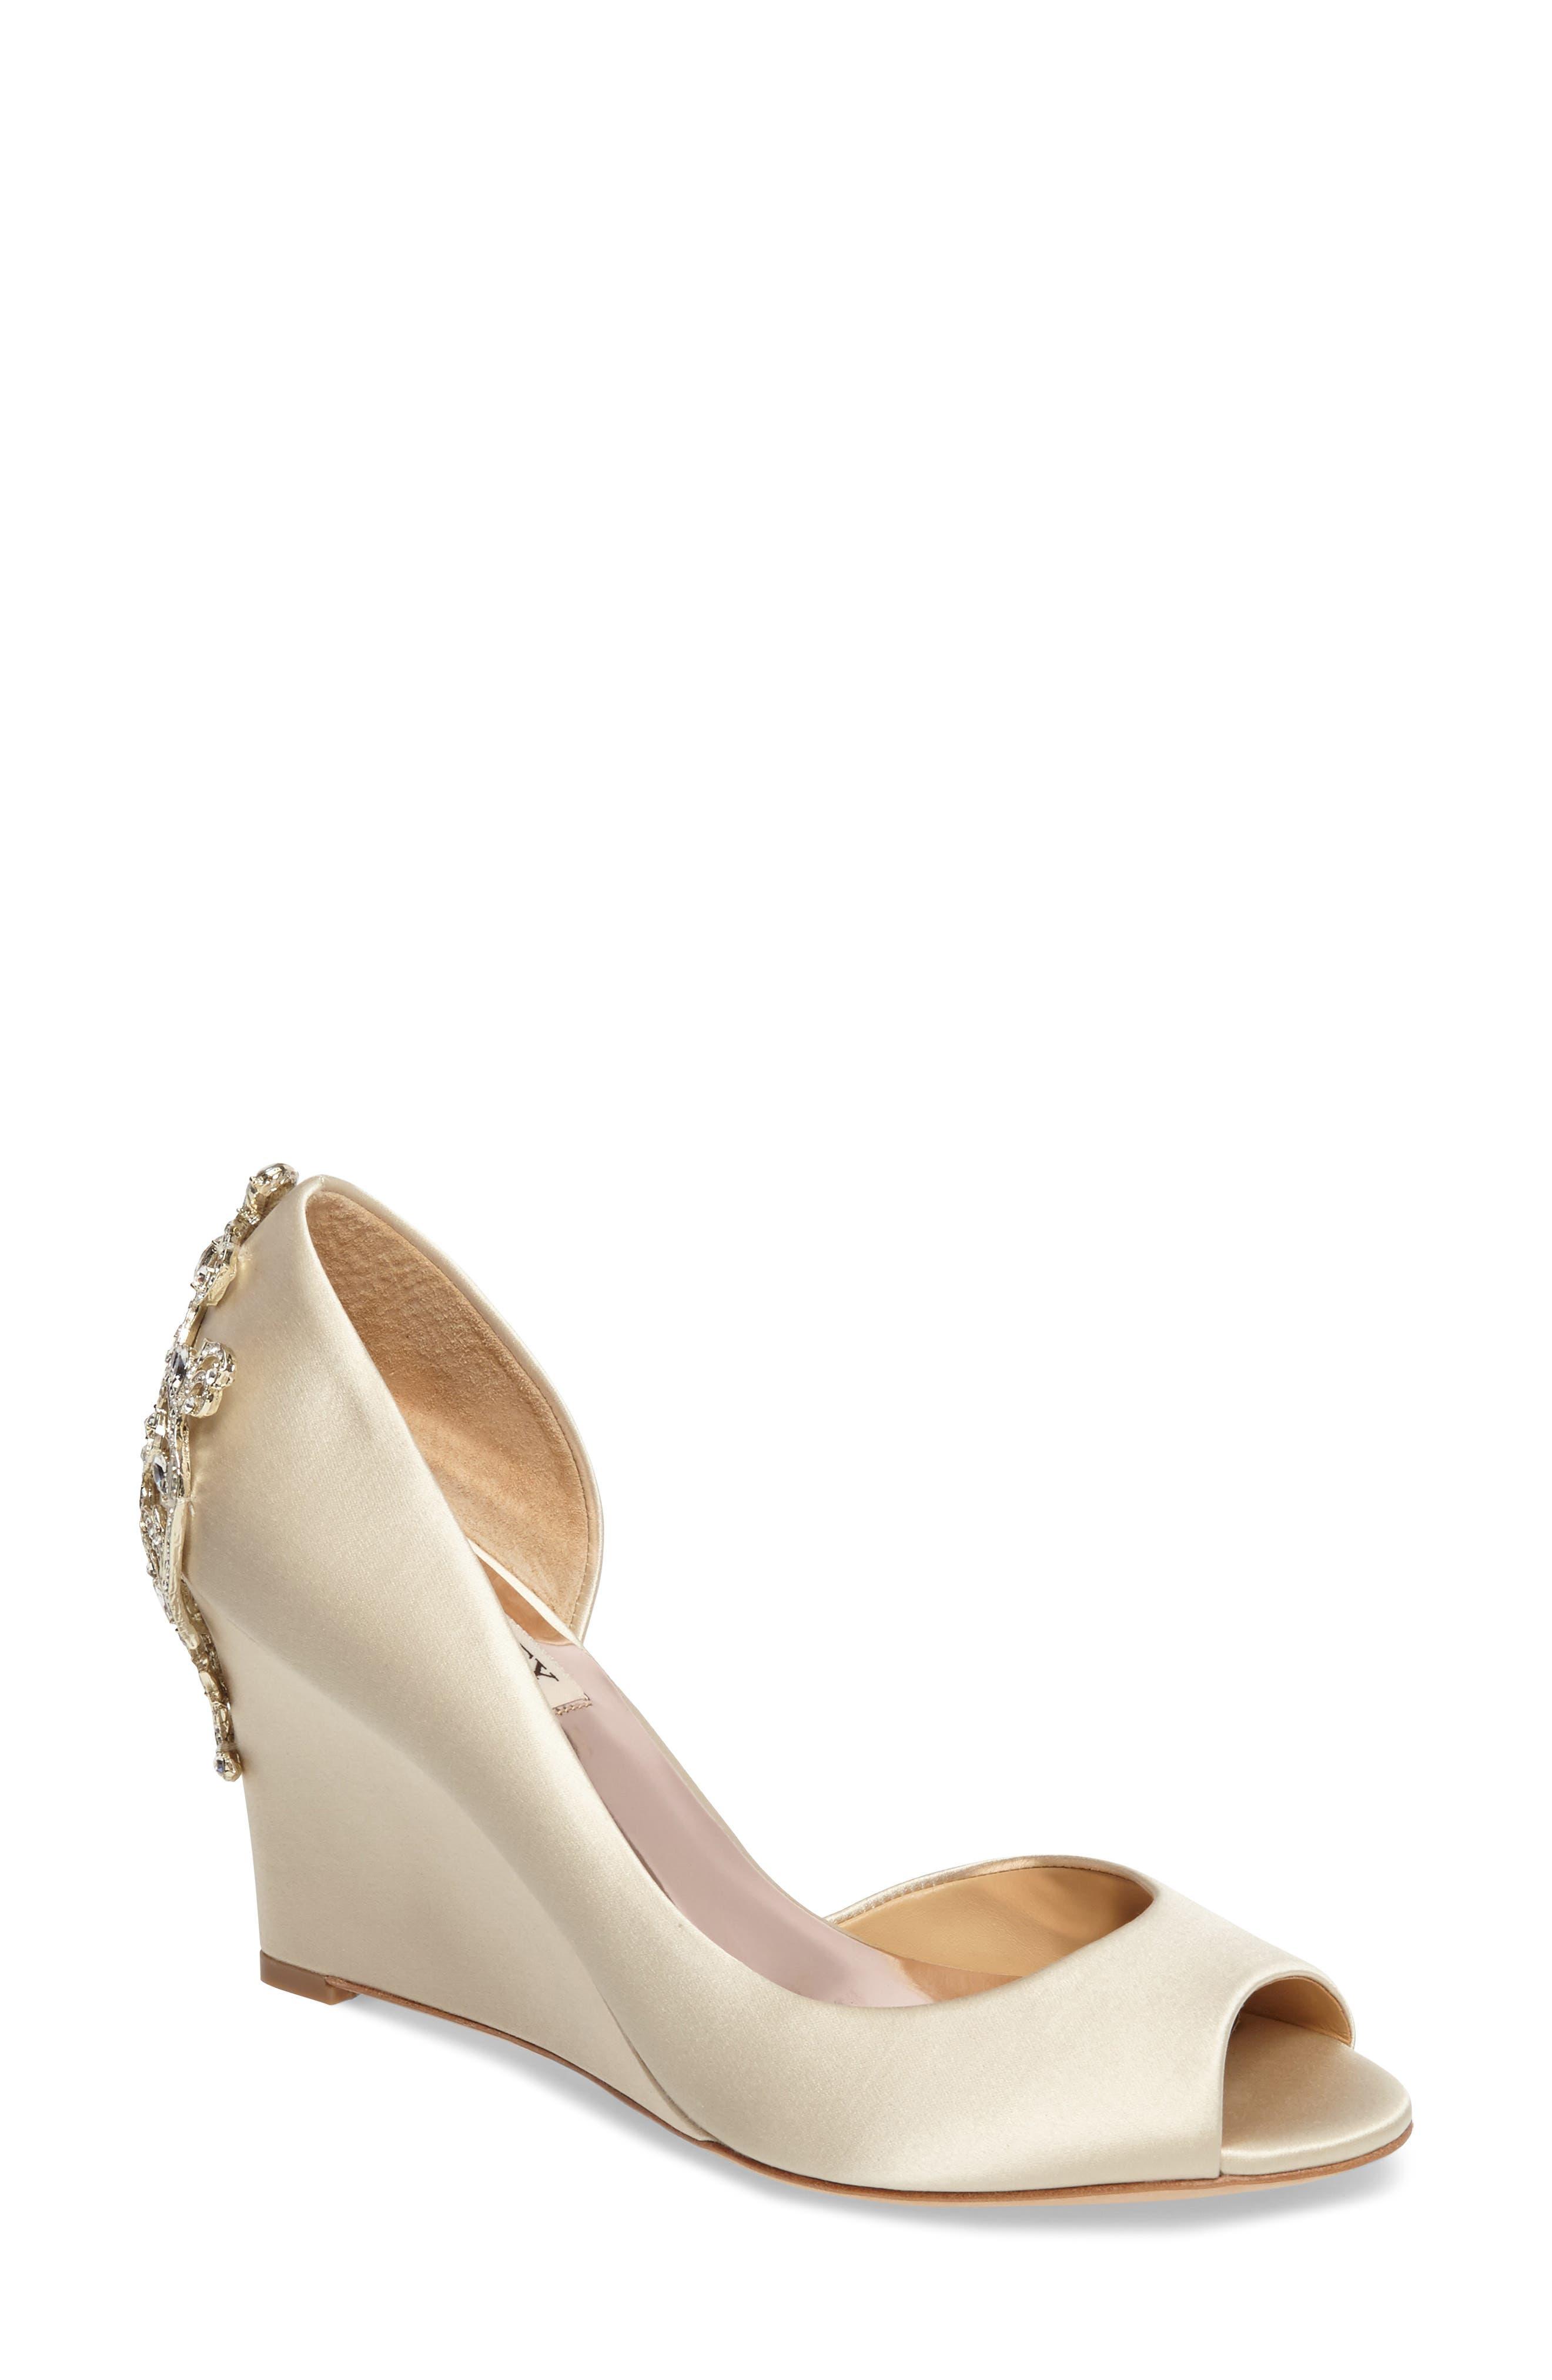 Meagan Embellished Peep Toe Wedge,                         Main,                         color, Ivory Satin